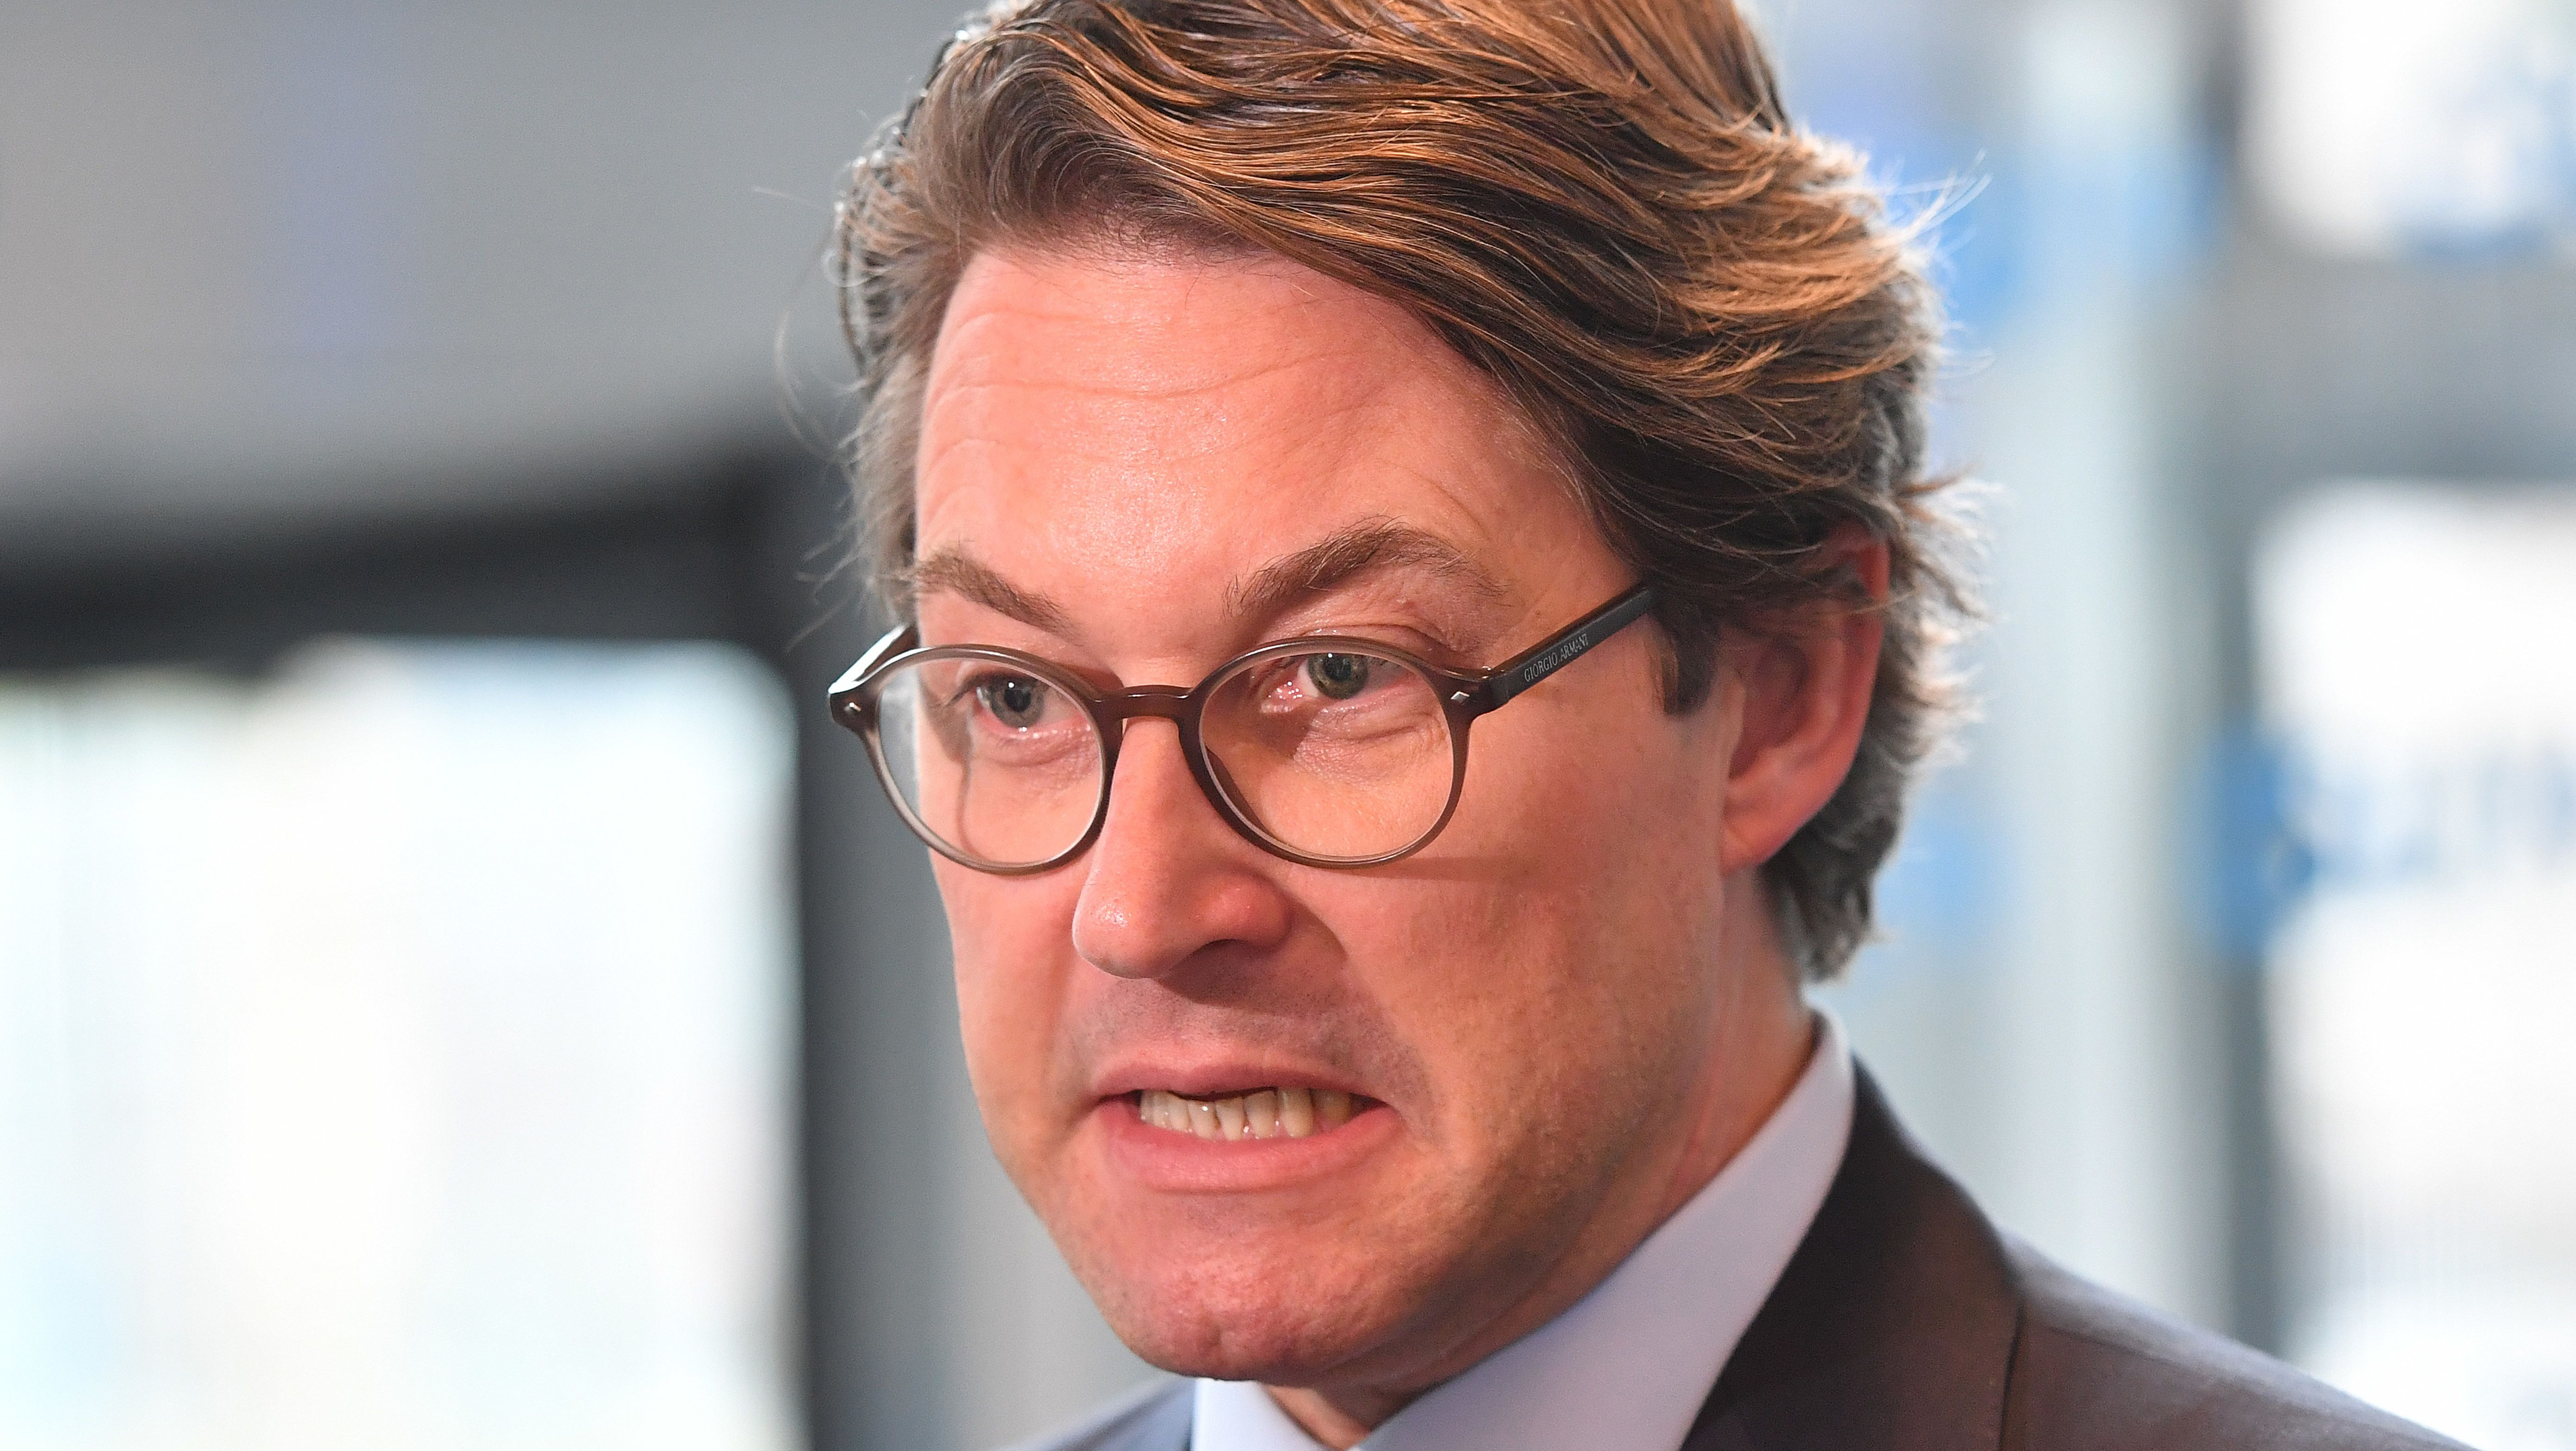 Andreas Scheuer, CSU